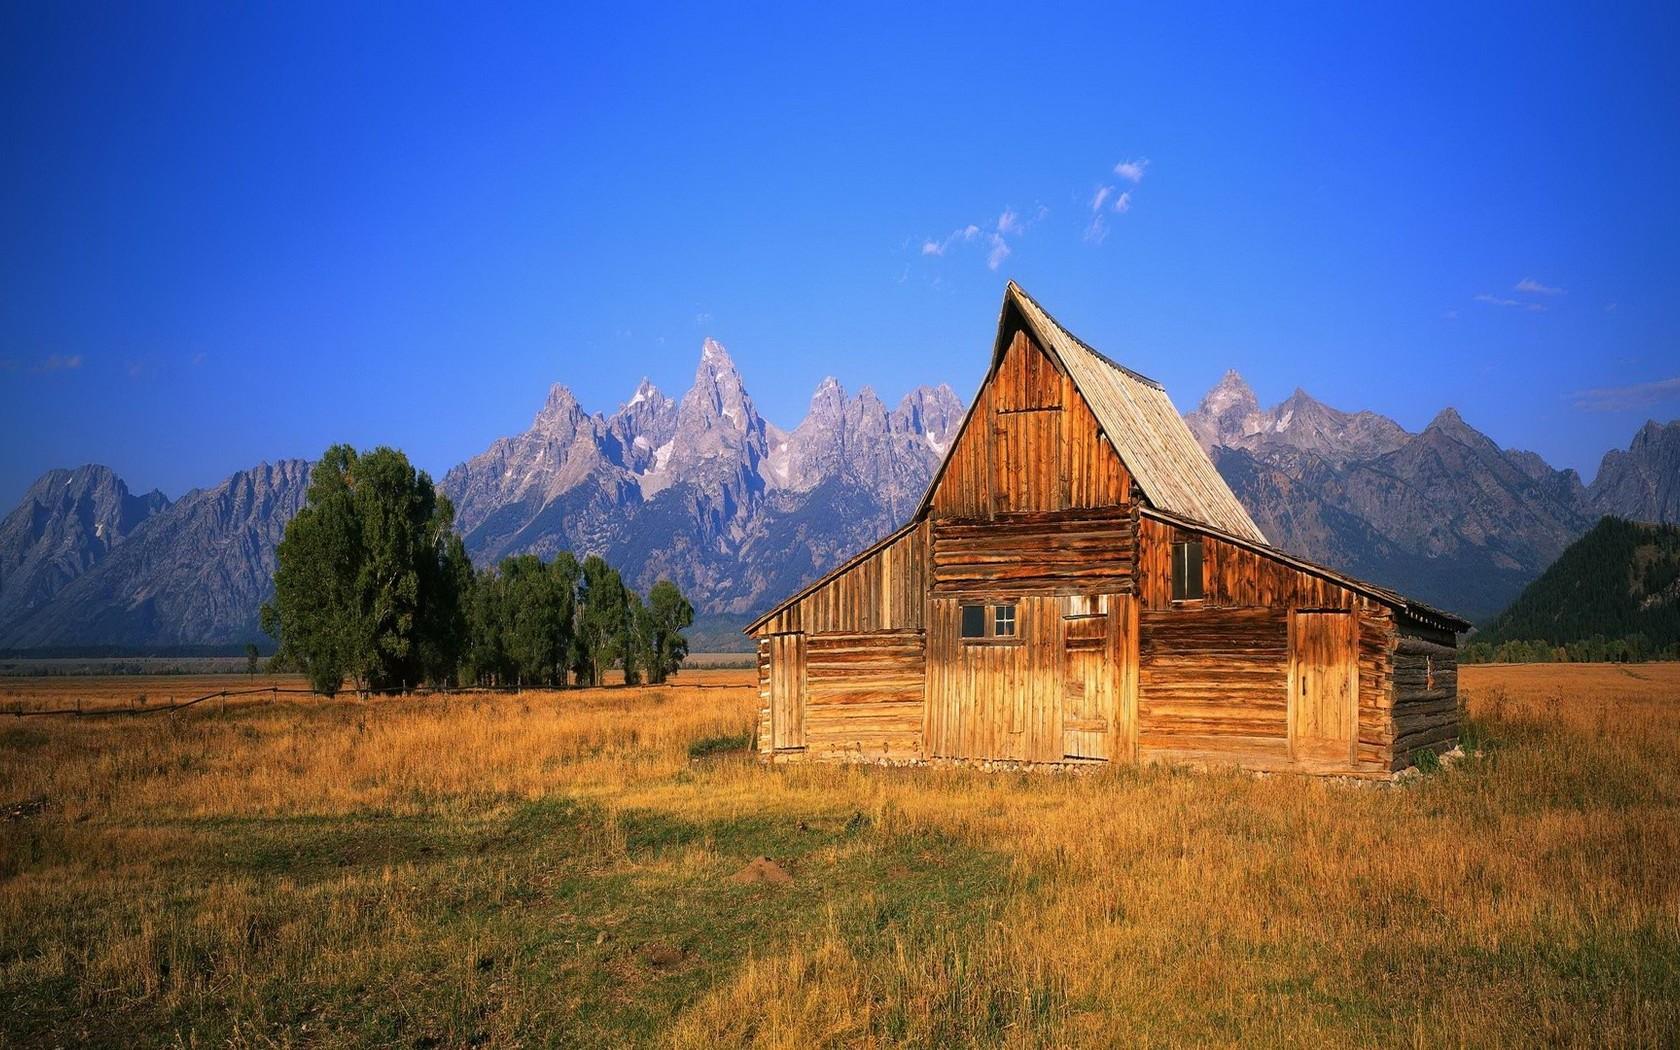 Wooden mountain cabin wallpaper 9535 1680x1050